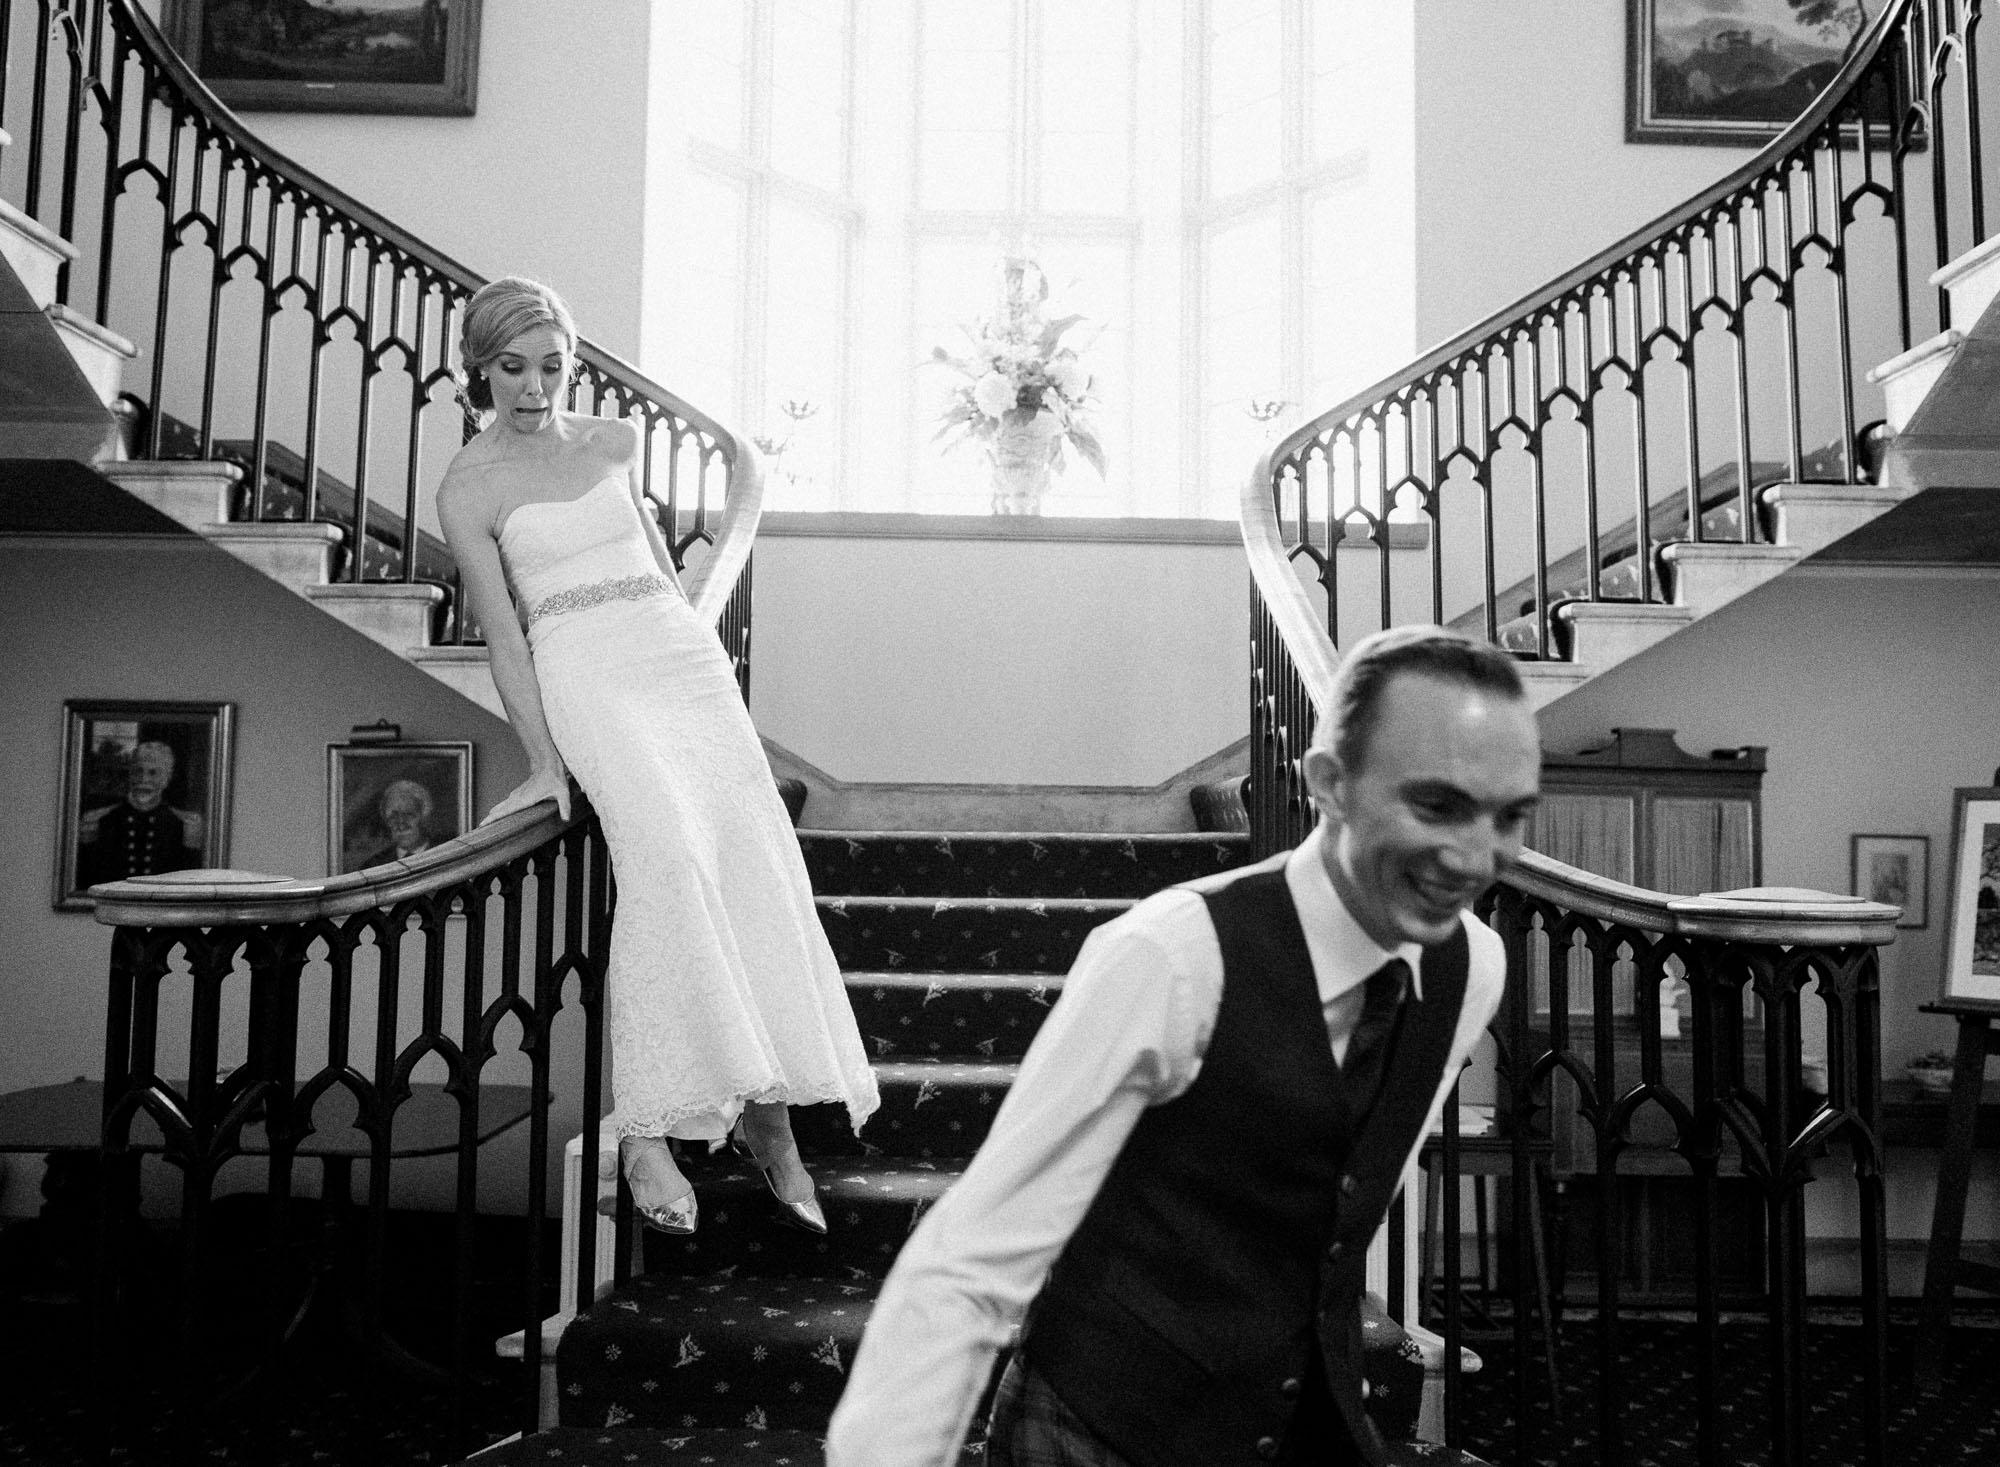 scottish_wedding_blairquhan_castle-97.jpg